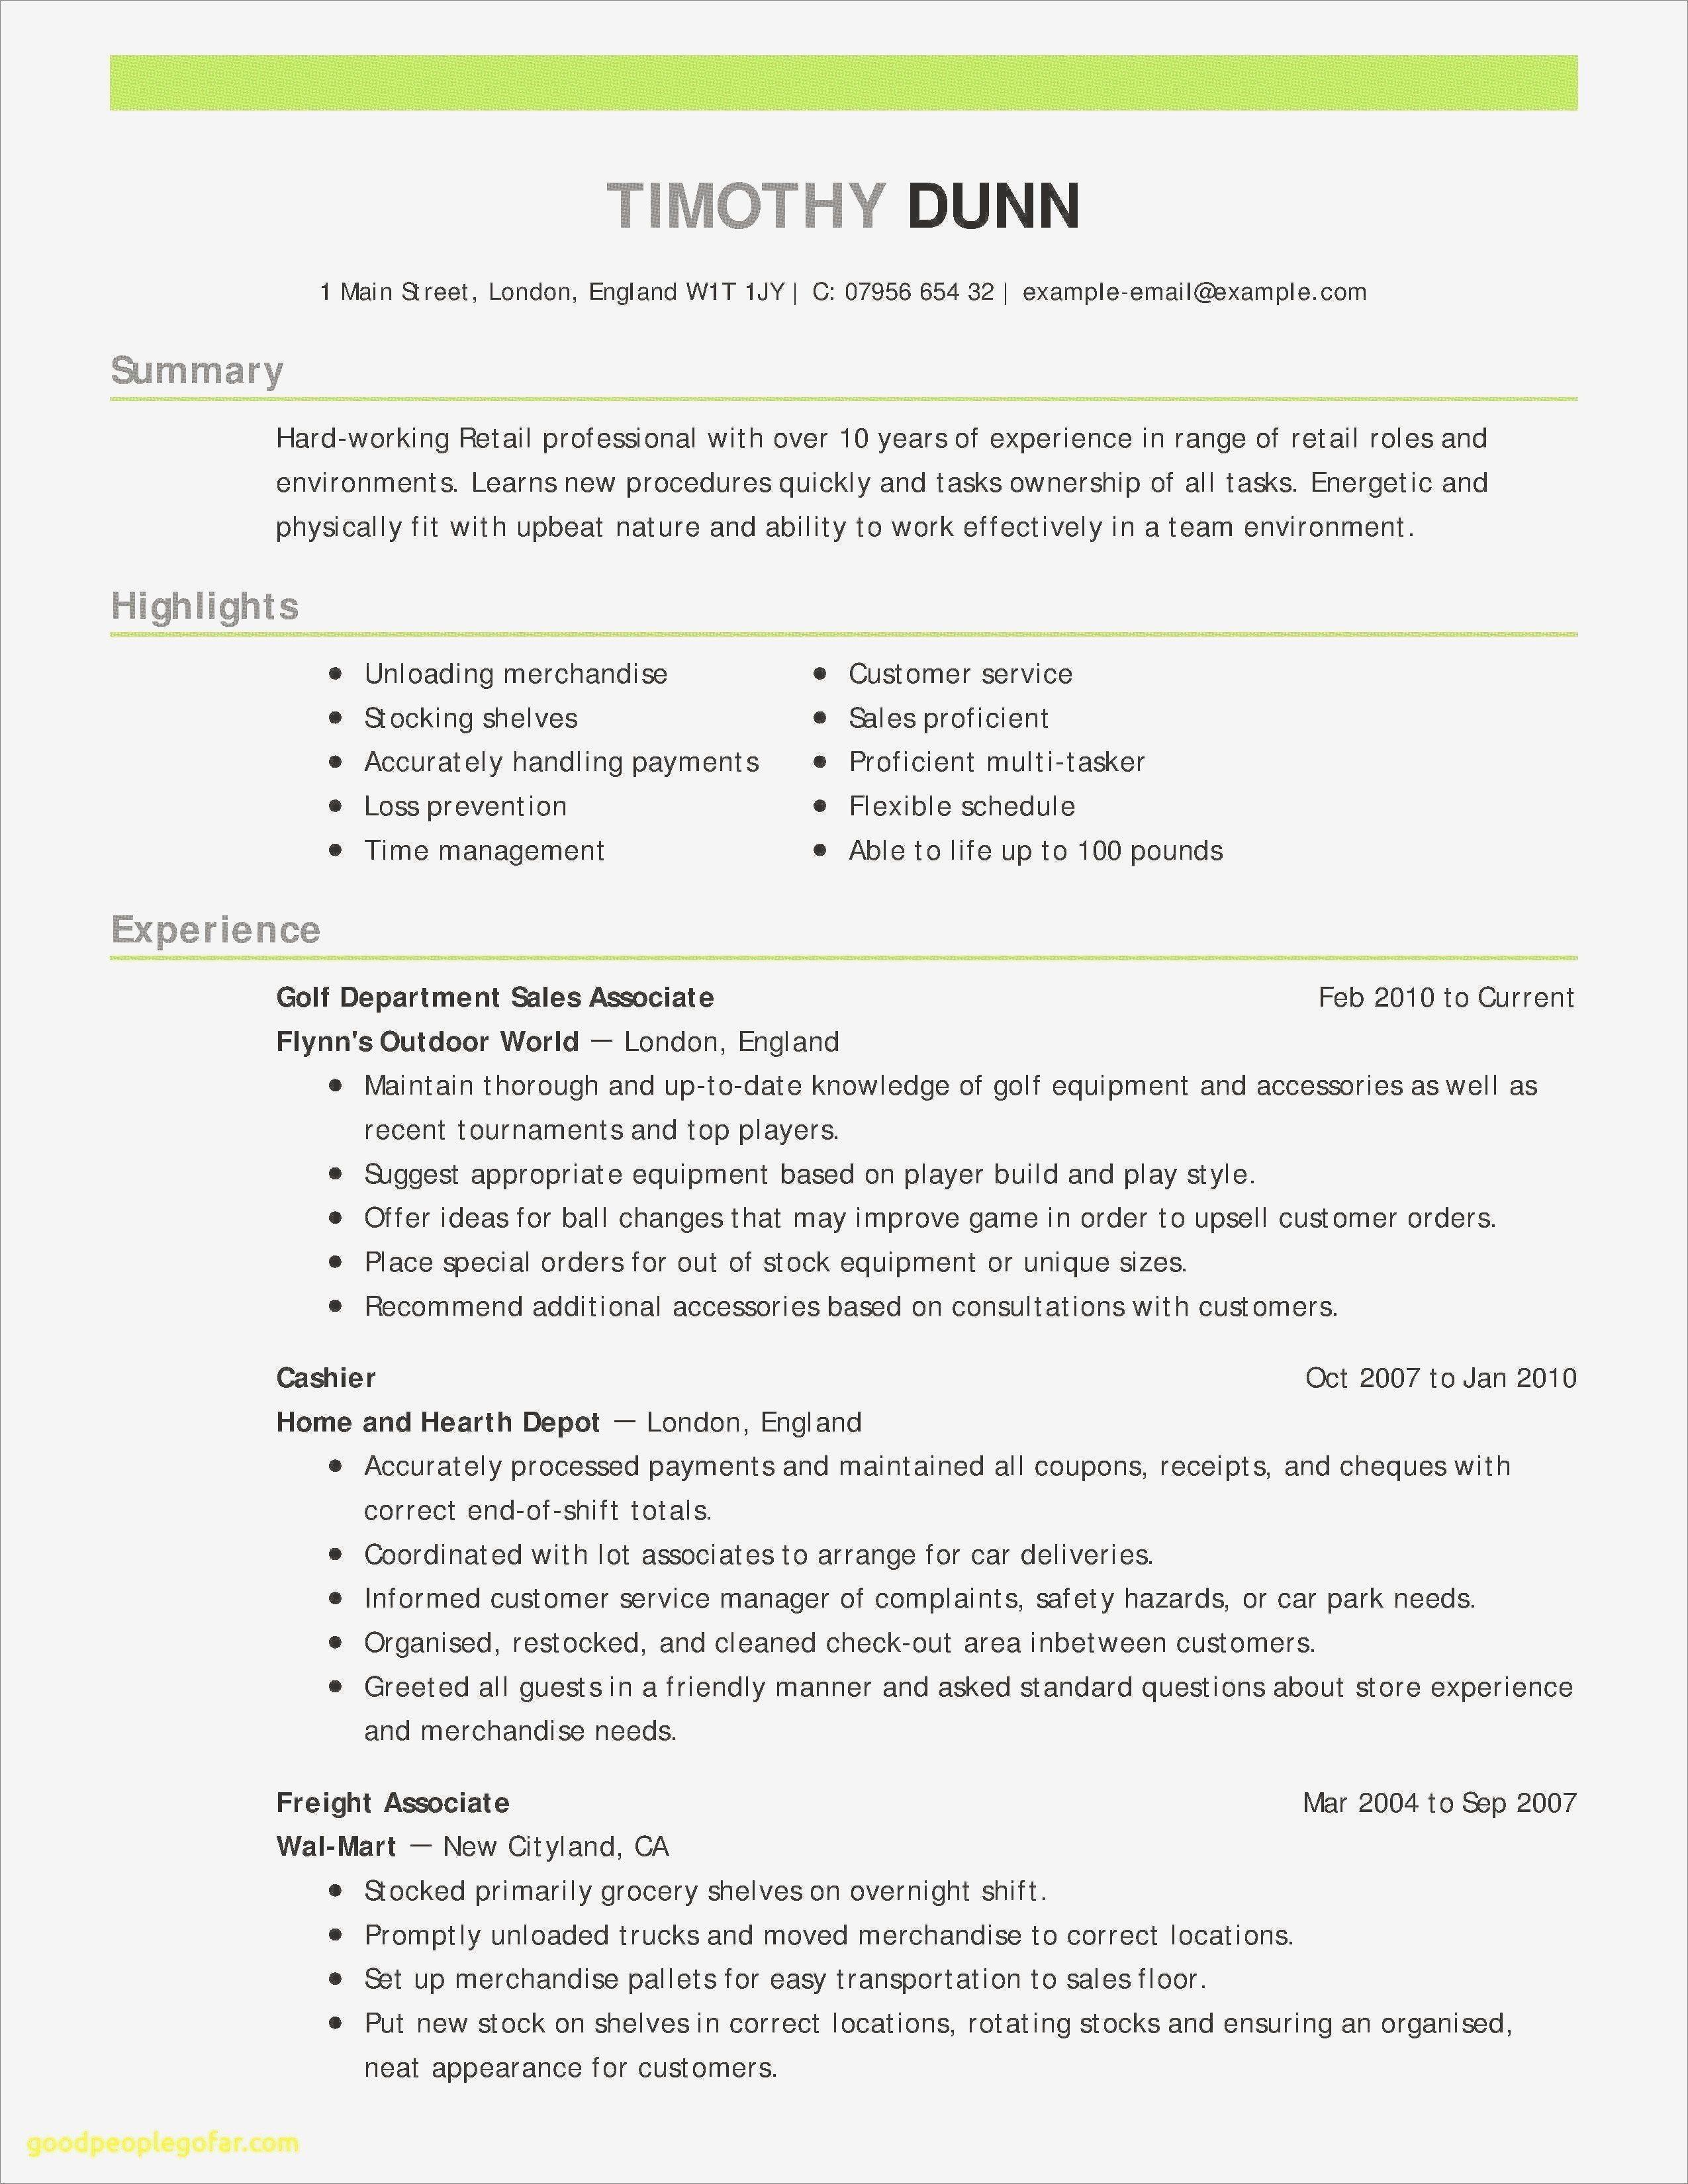 Sales Associate Resume Examples It Resume Examples Karate Do Nrw De Resume Objective Examples Customer Service Resume Examples Good Resume Examples